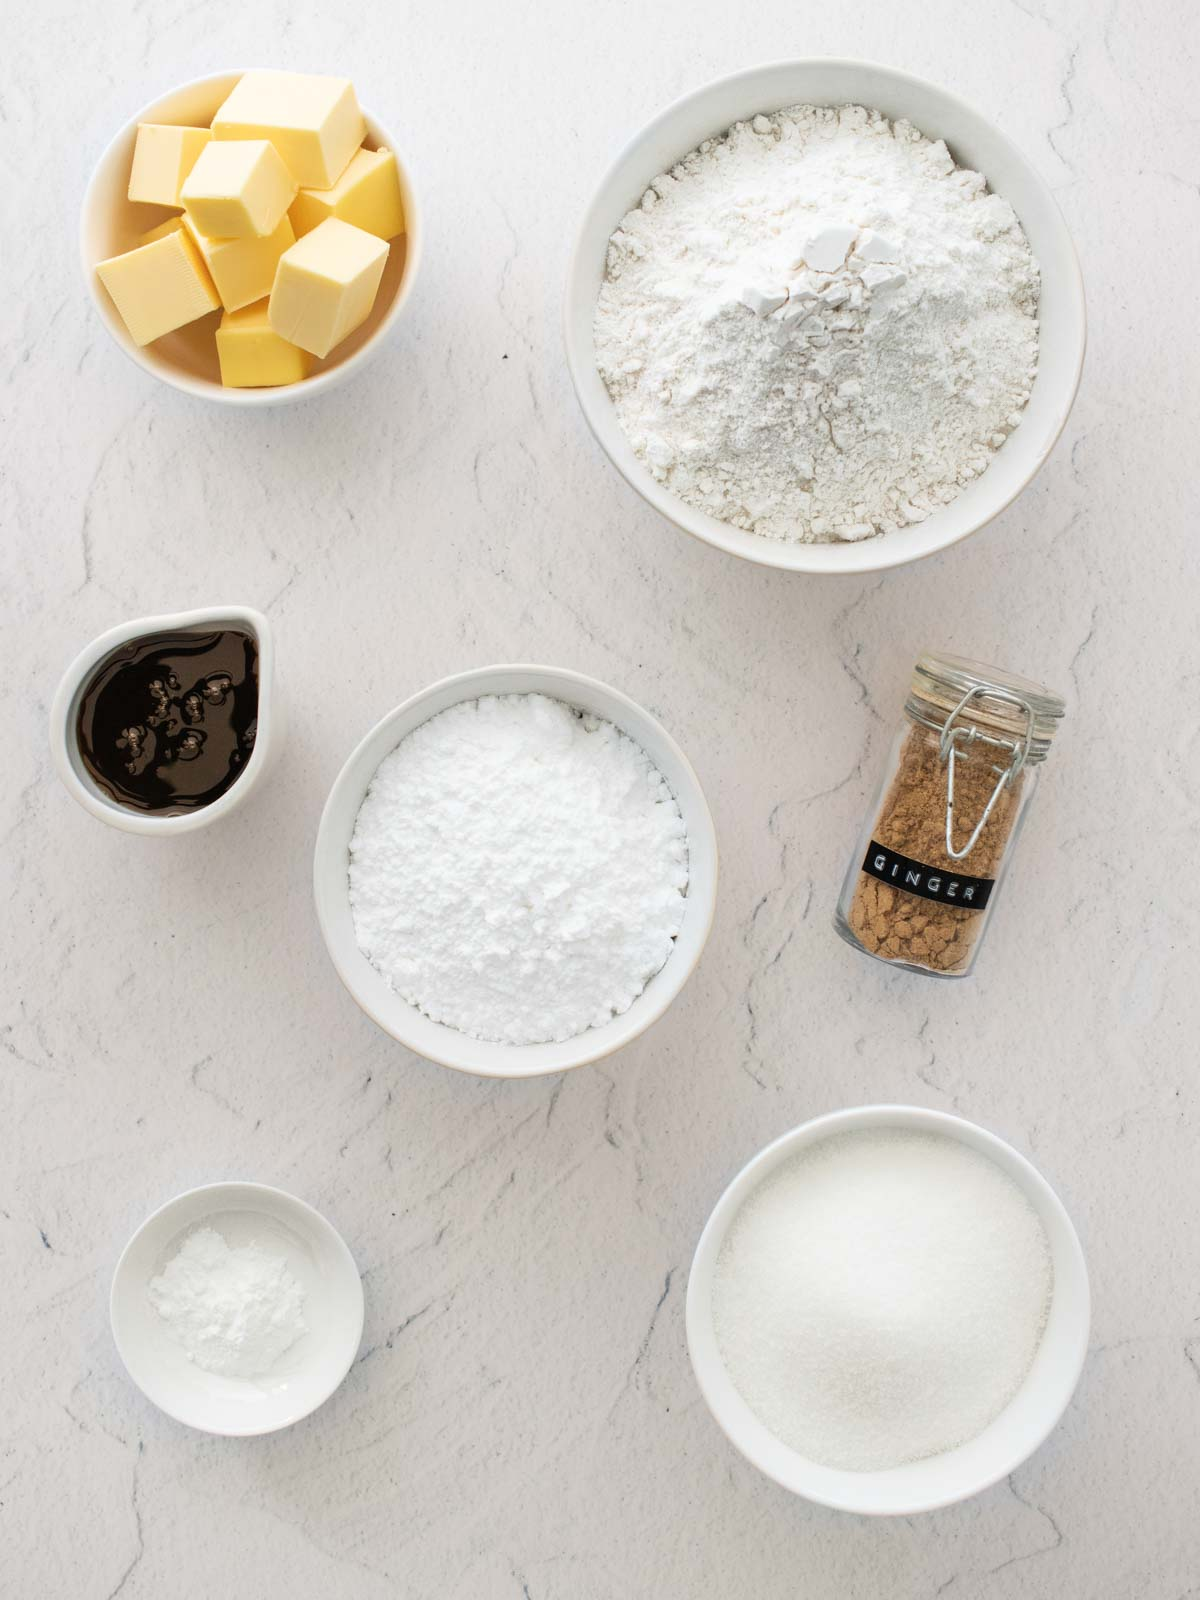 Ginger crunch ingredients